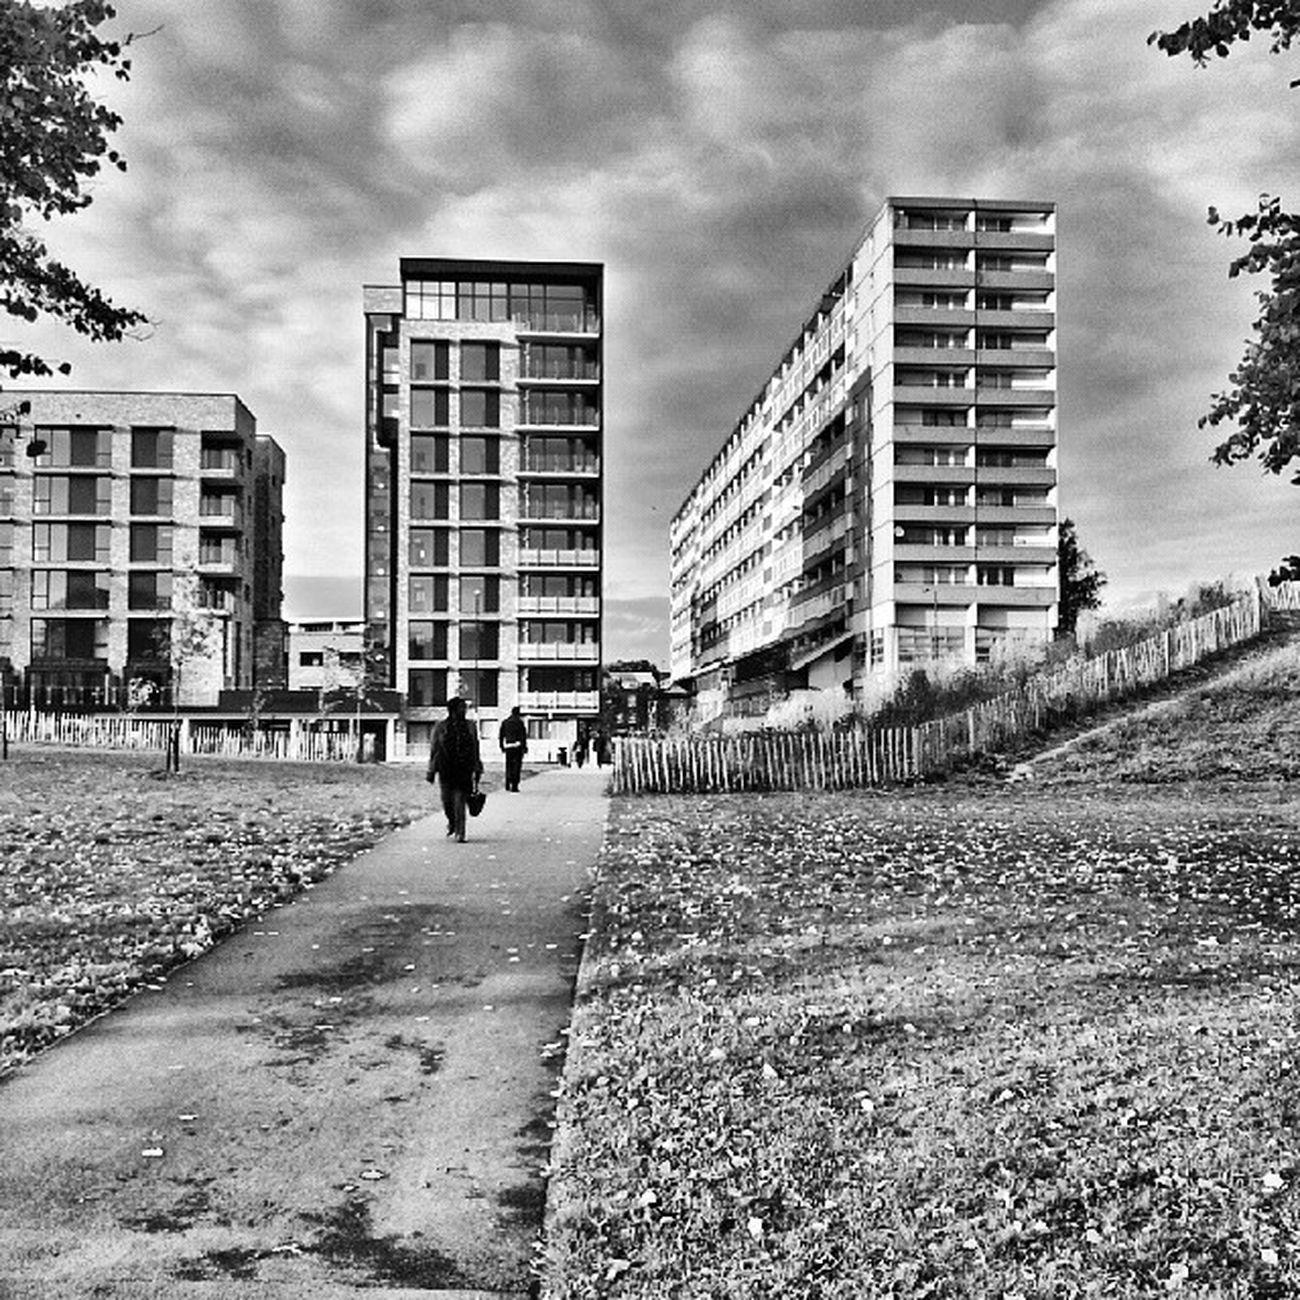 Aylesburyestate Burgesspark Bnw_city Bnw_city_architecture bnw_city_streetlife bnw_london